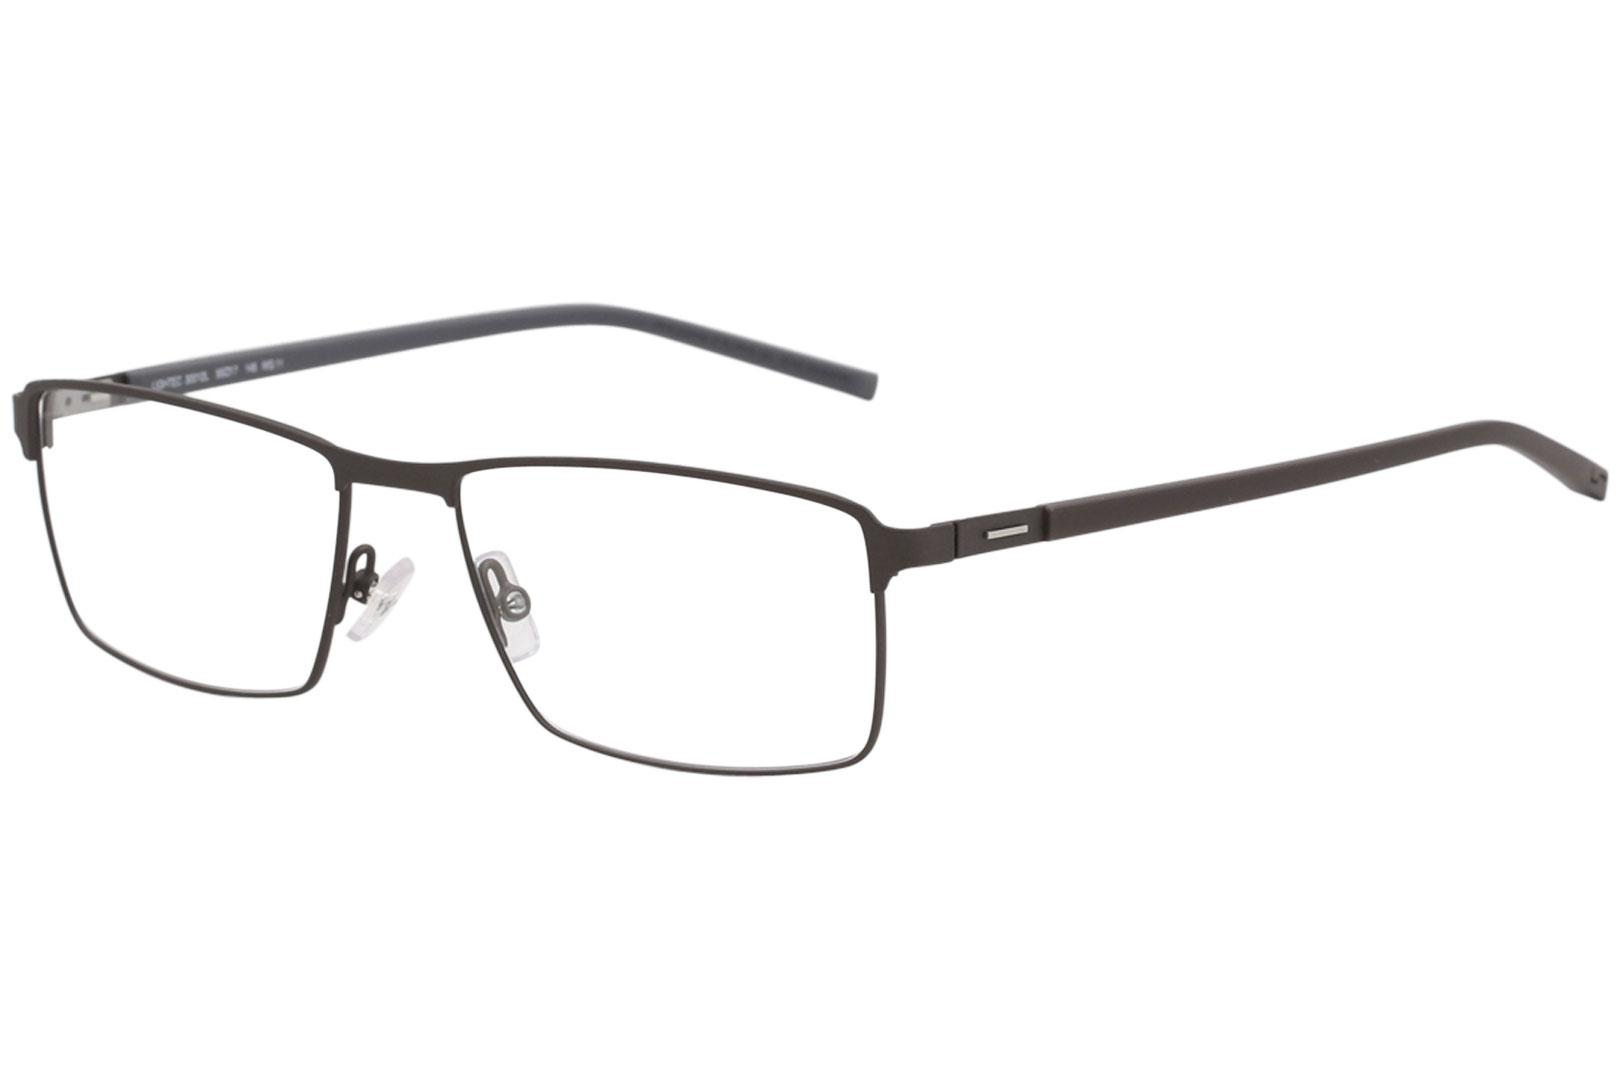 Image of Morel Men's Eyeglasses Lightec 30012L 30012/L Full Rim Optical Frame - Brown   MG11 - Lens 55 Bridge 17 Temple 145mm